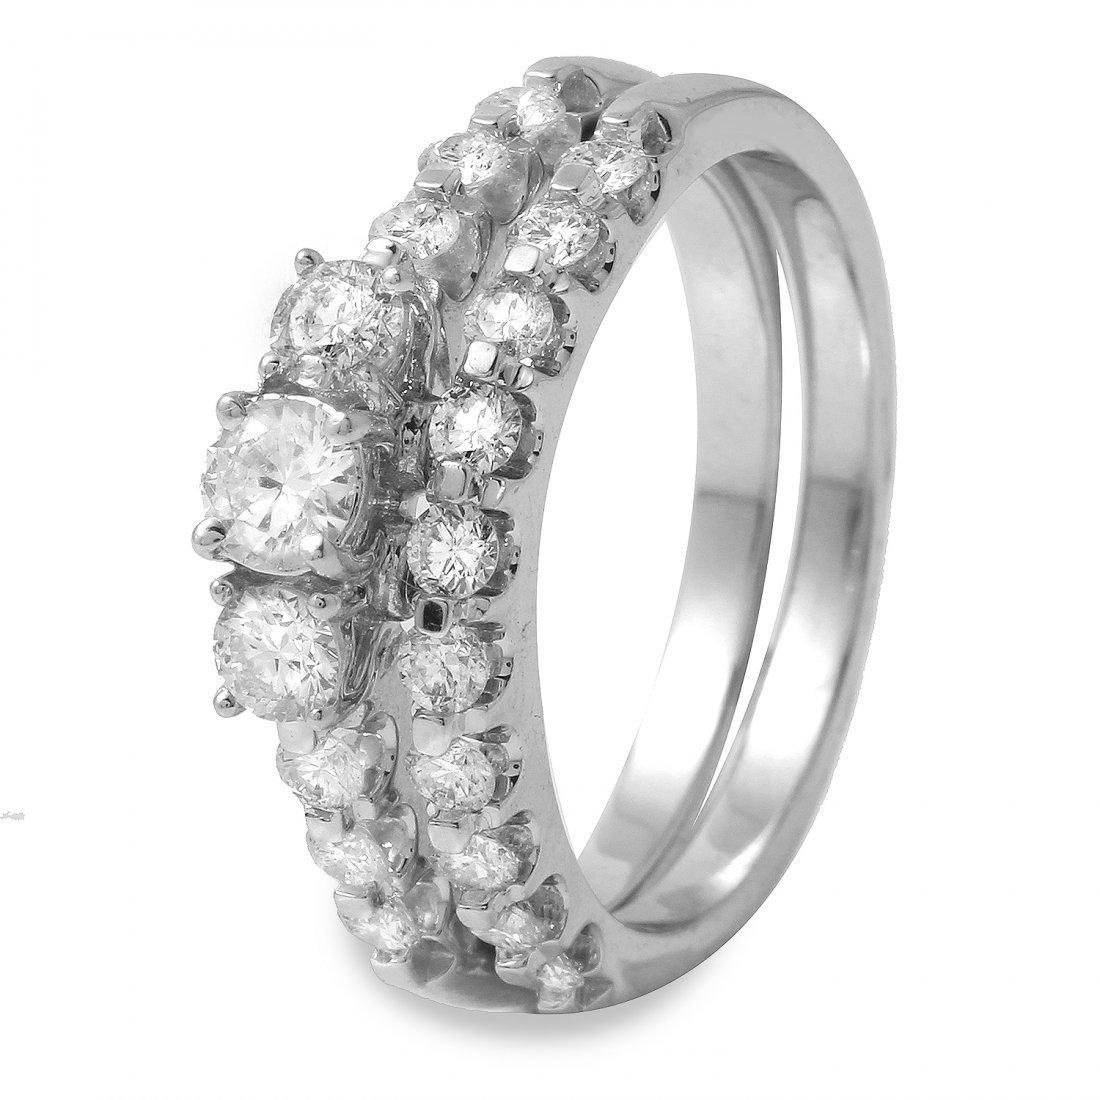 1CTW Diamond 14K White Gold Ring